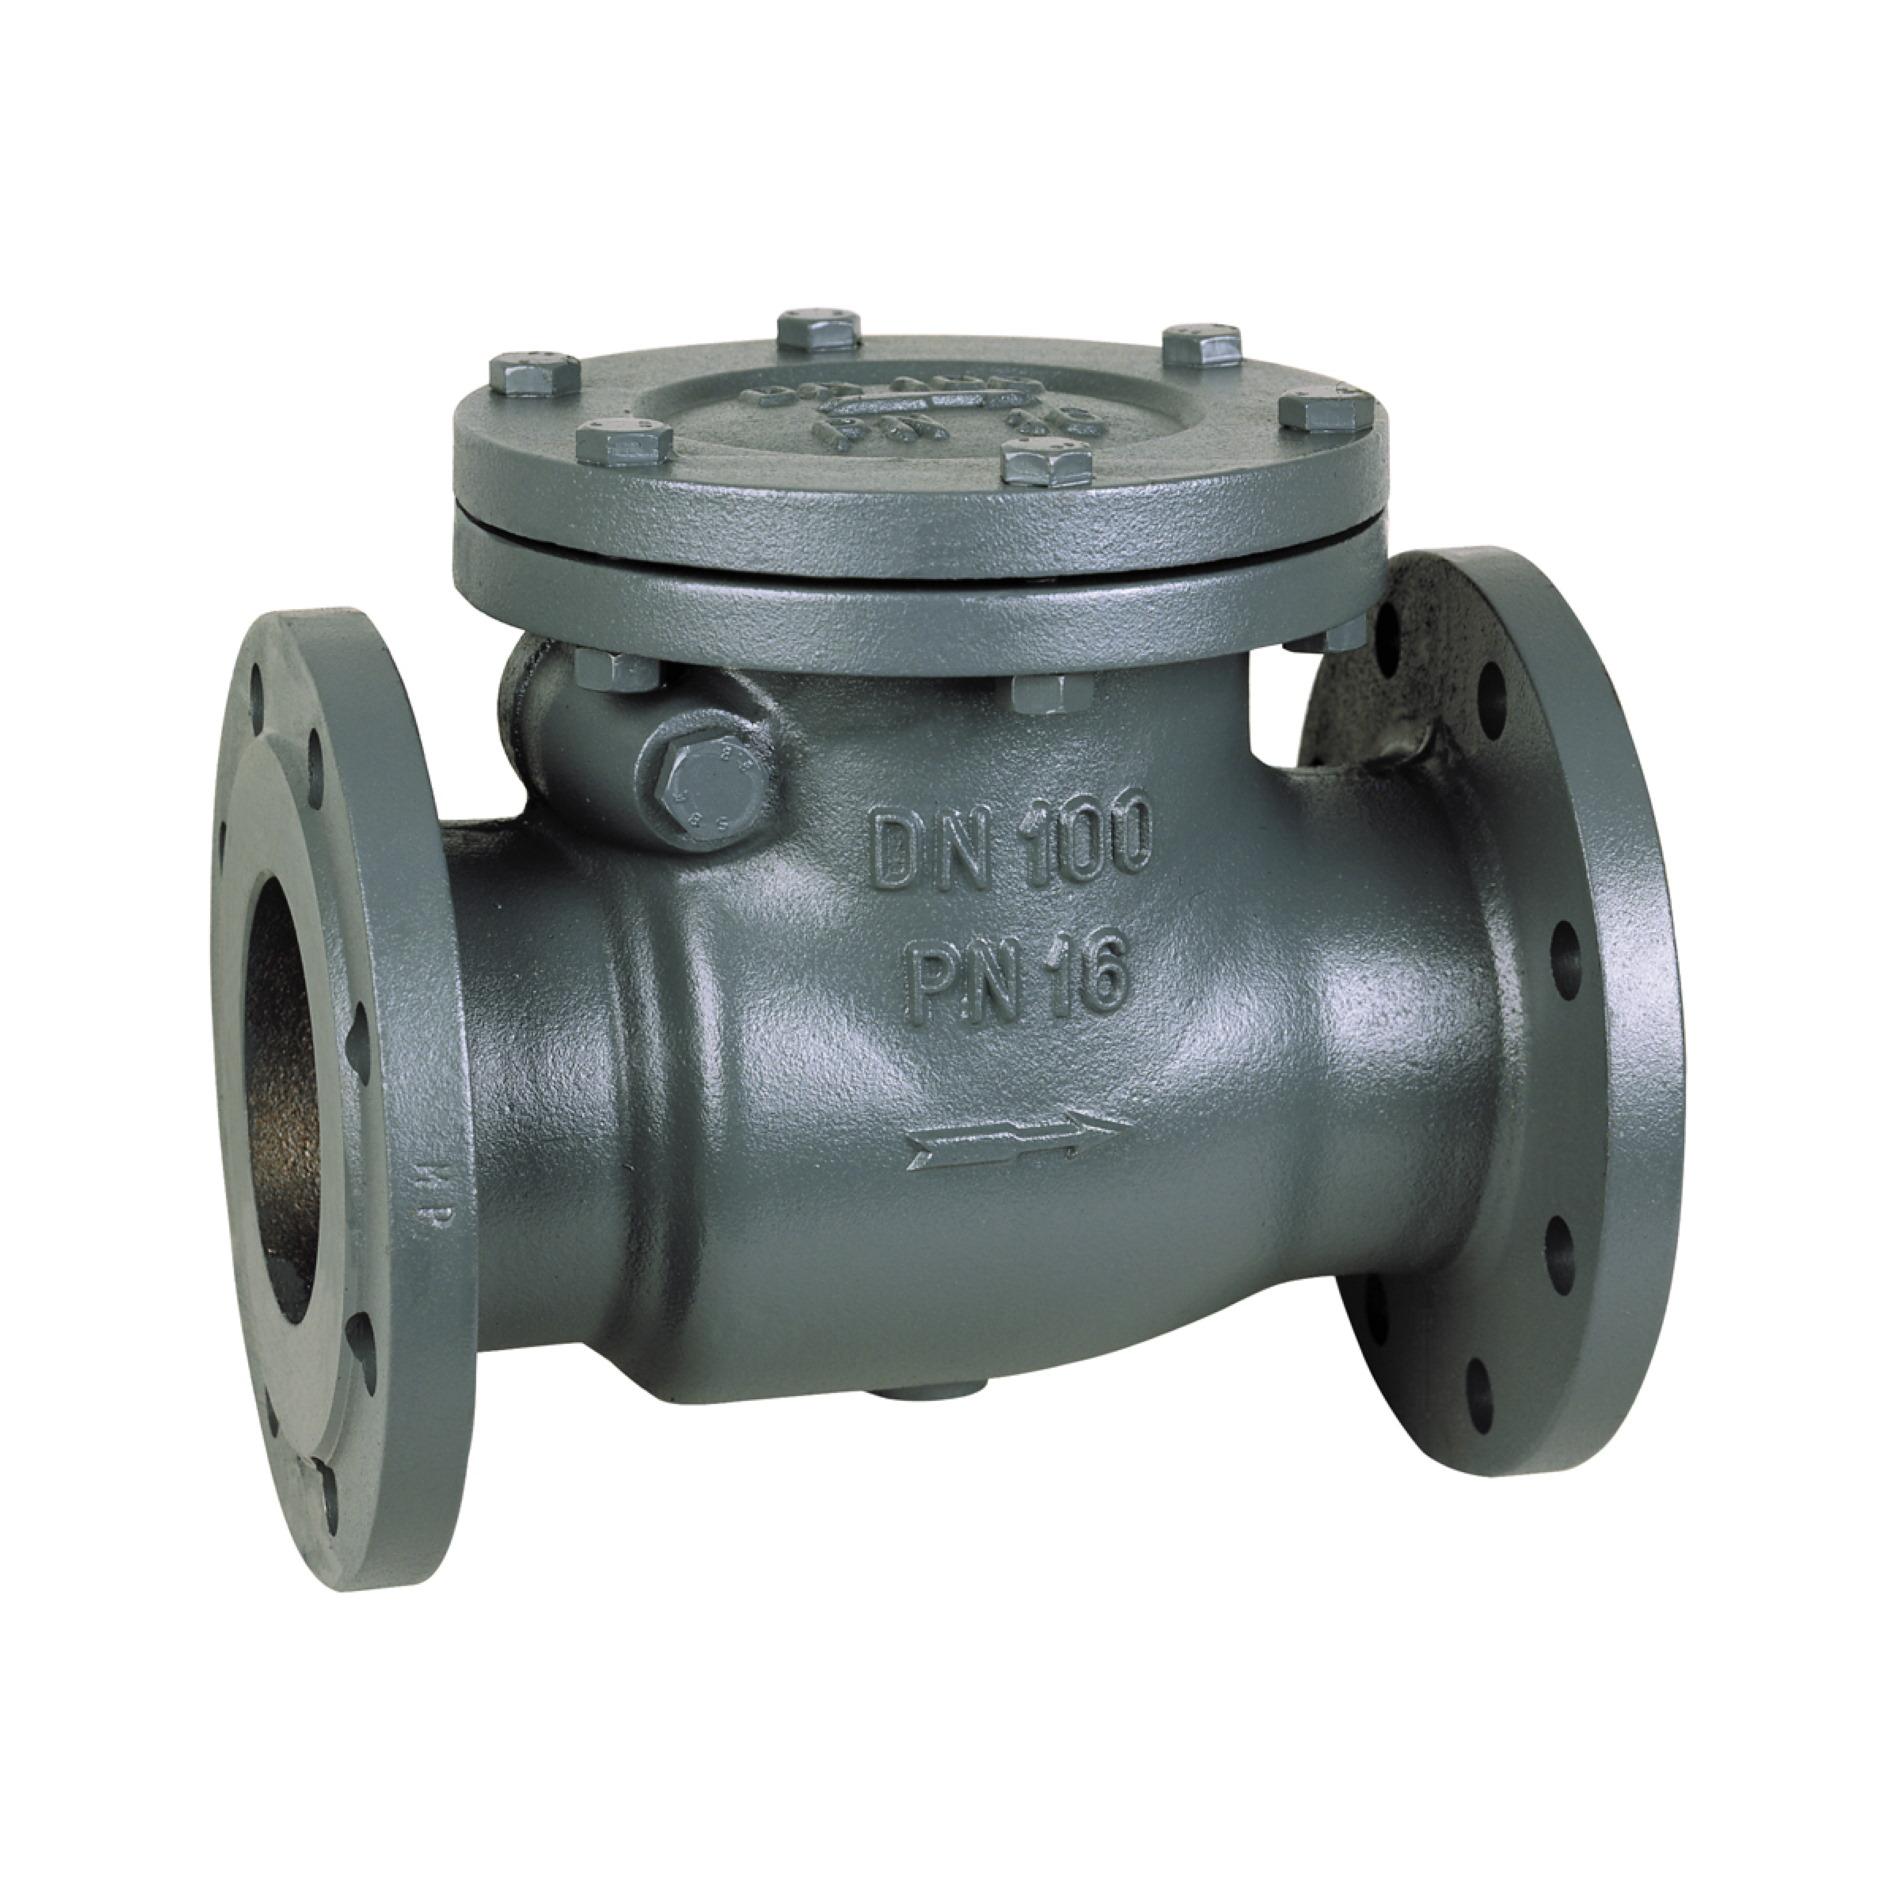 465 Valvola clapet ghisa flangiata Cast iron flanged swing check valve